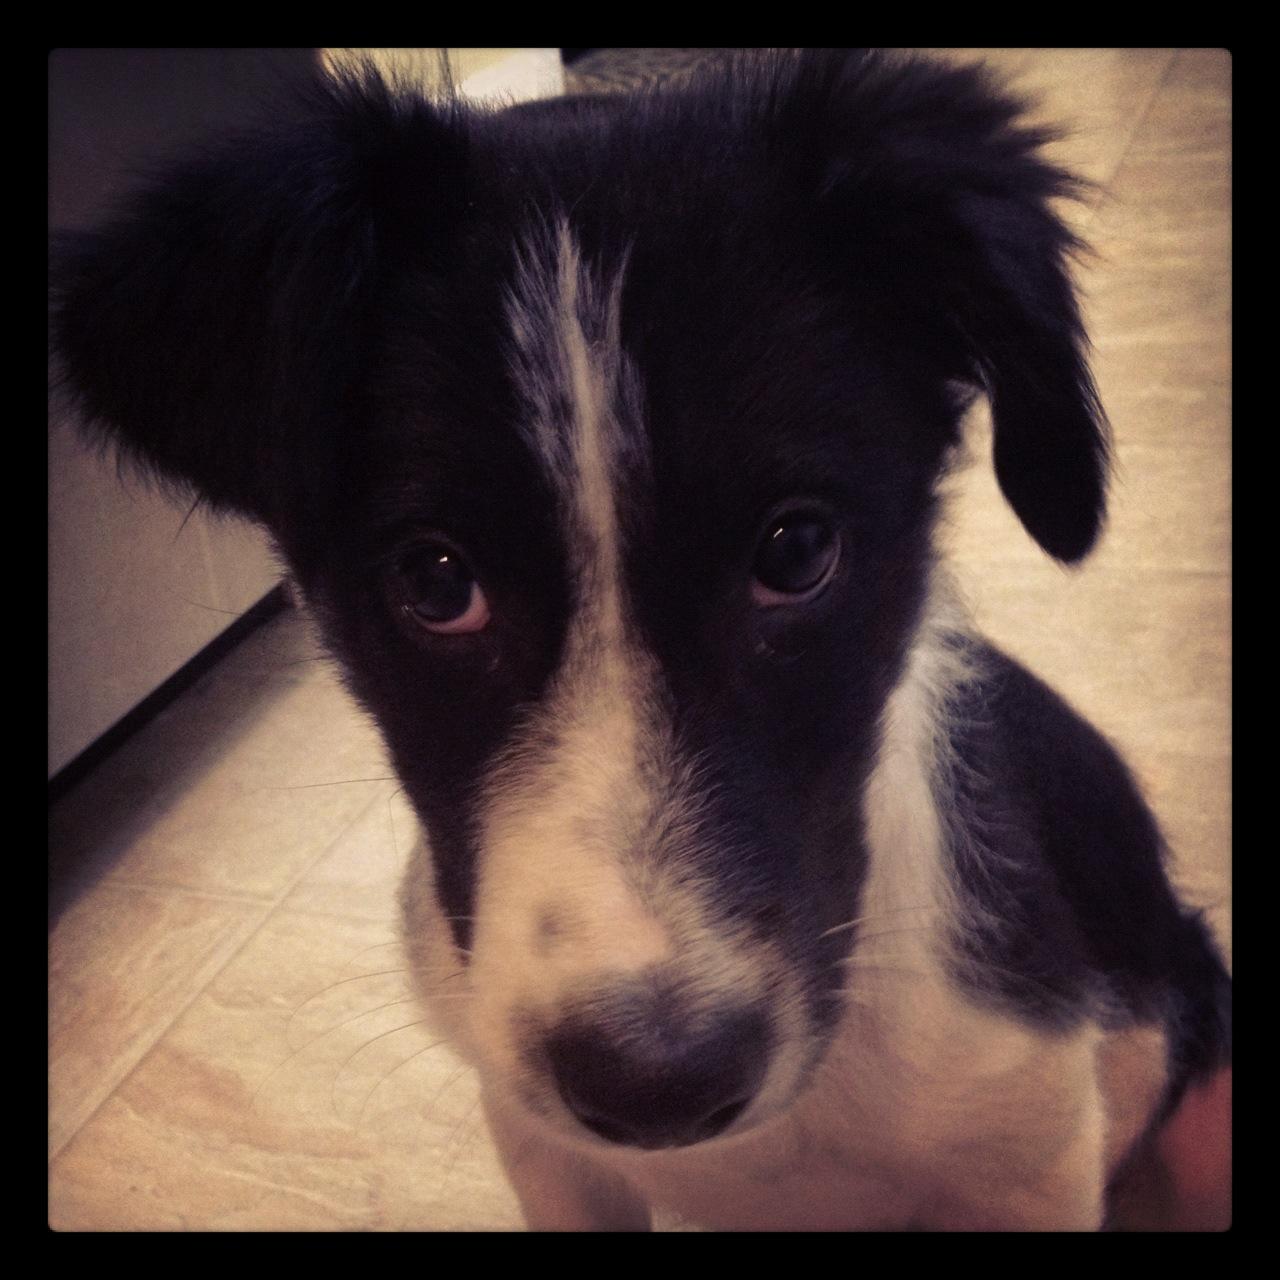 Oreo looking cute